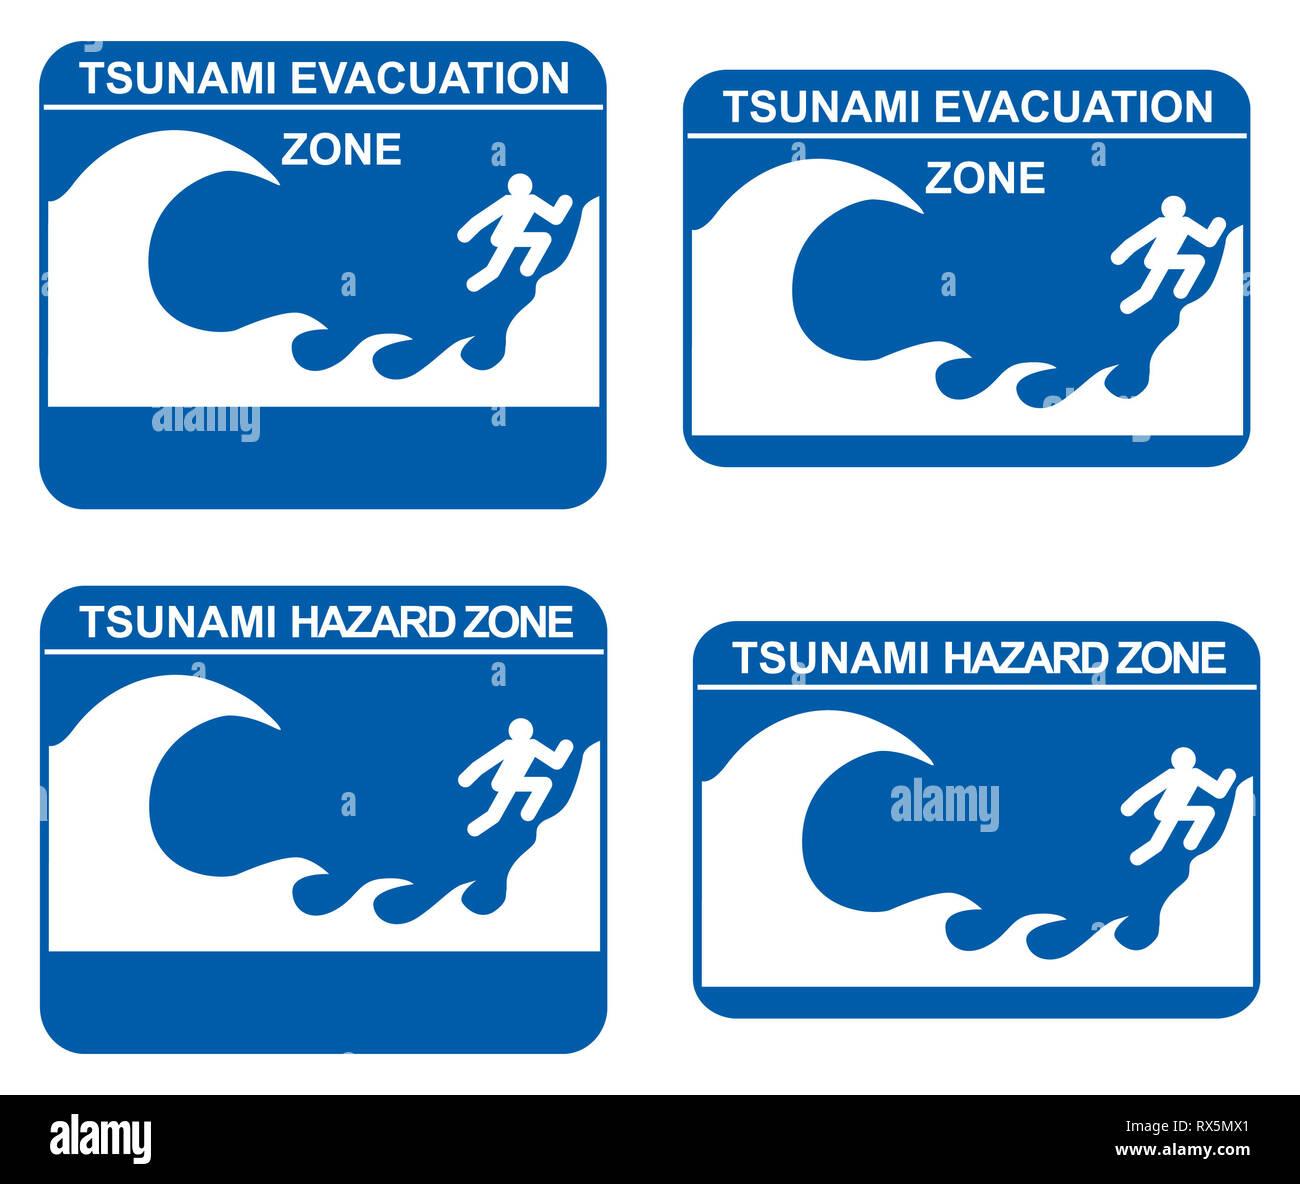 Tsunami warning signs showing evacuation and hazard zones